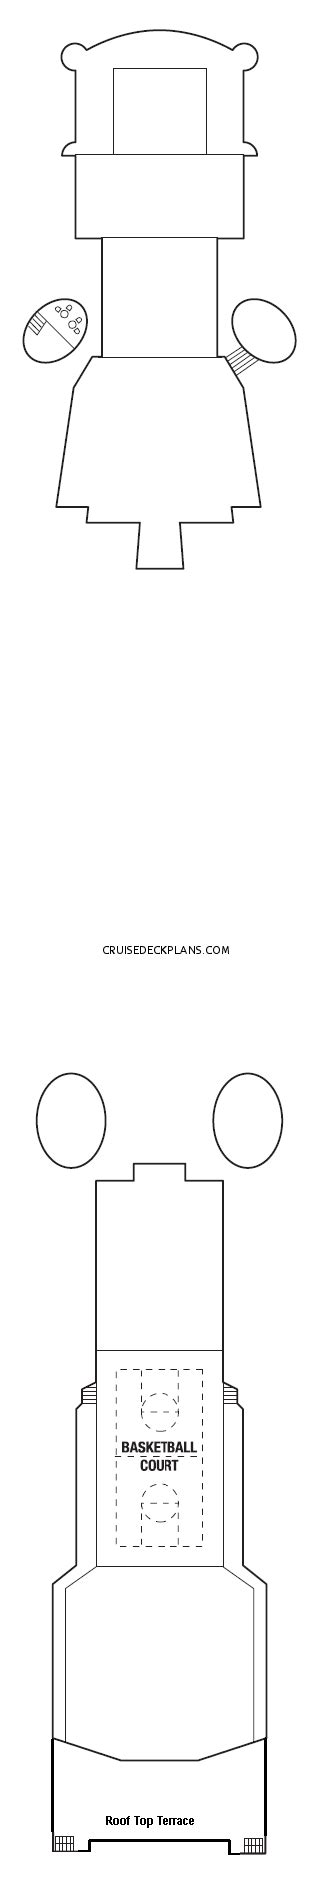 constellation deck plan 2017 constellation concierge class category